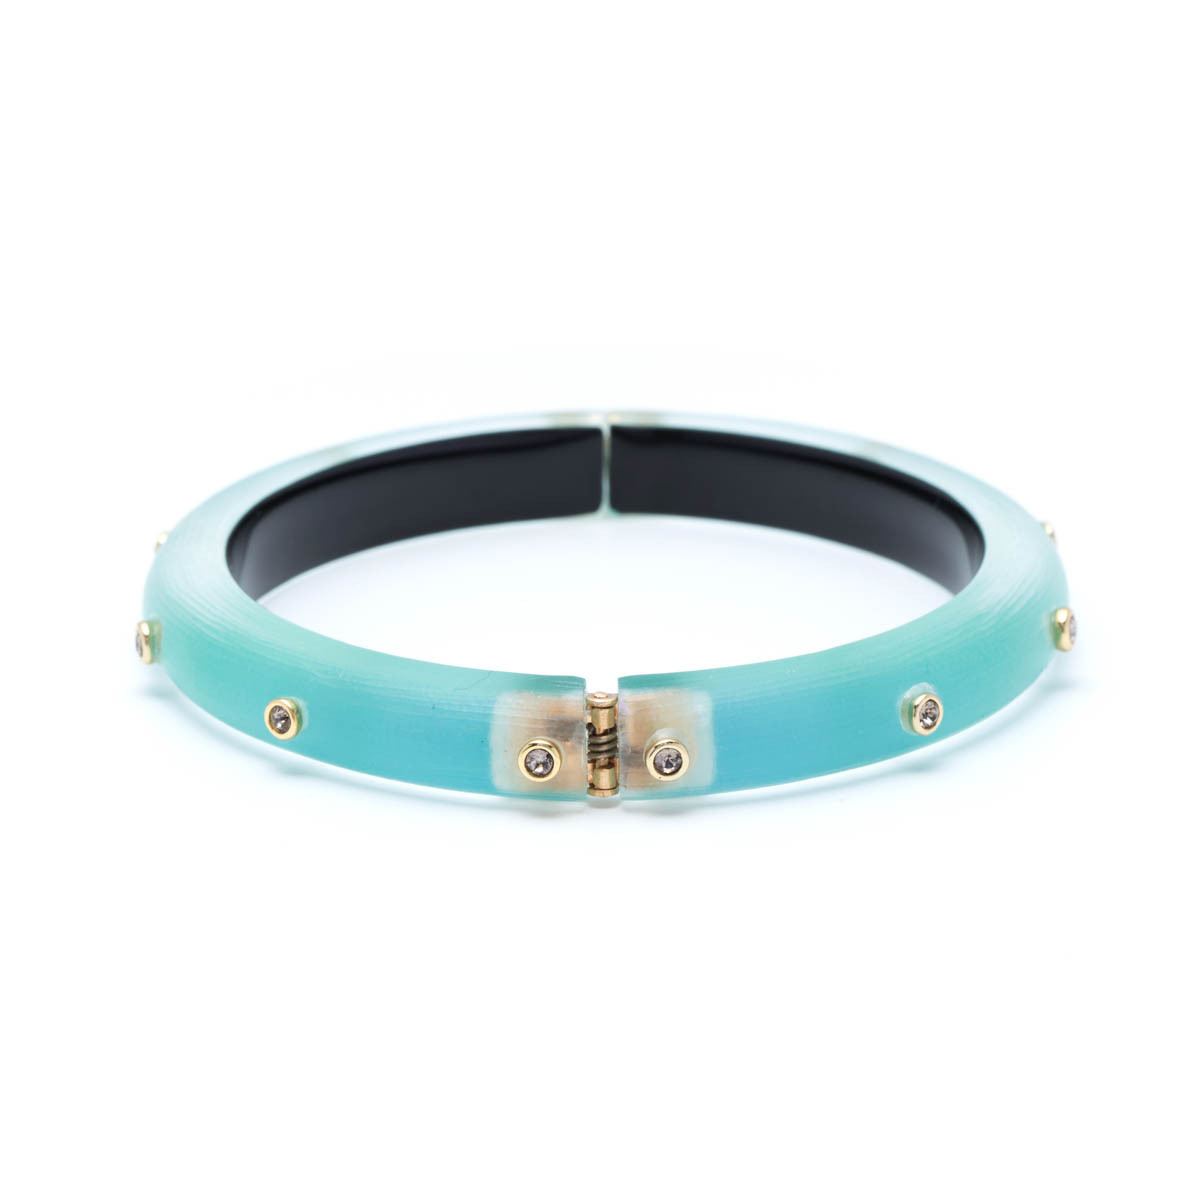 Alexis Bittar Golden Studded Hinge Bangle Bracelet Metallic teal izIv66s